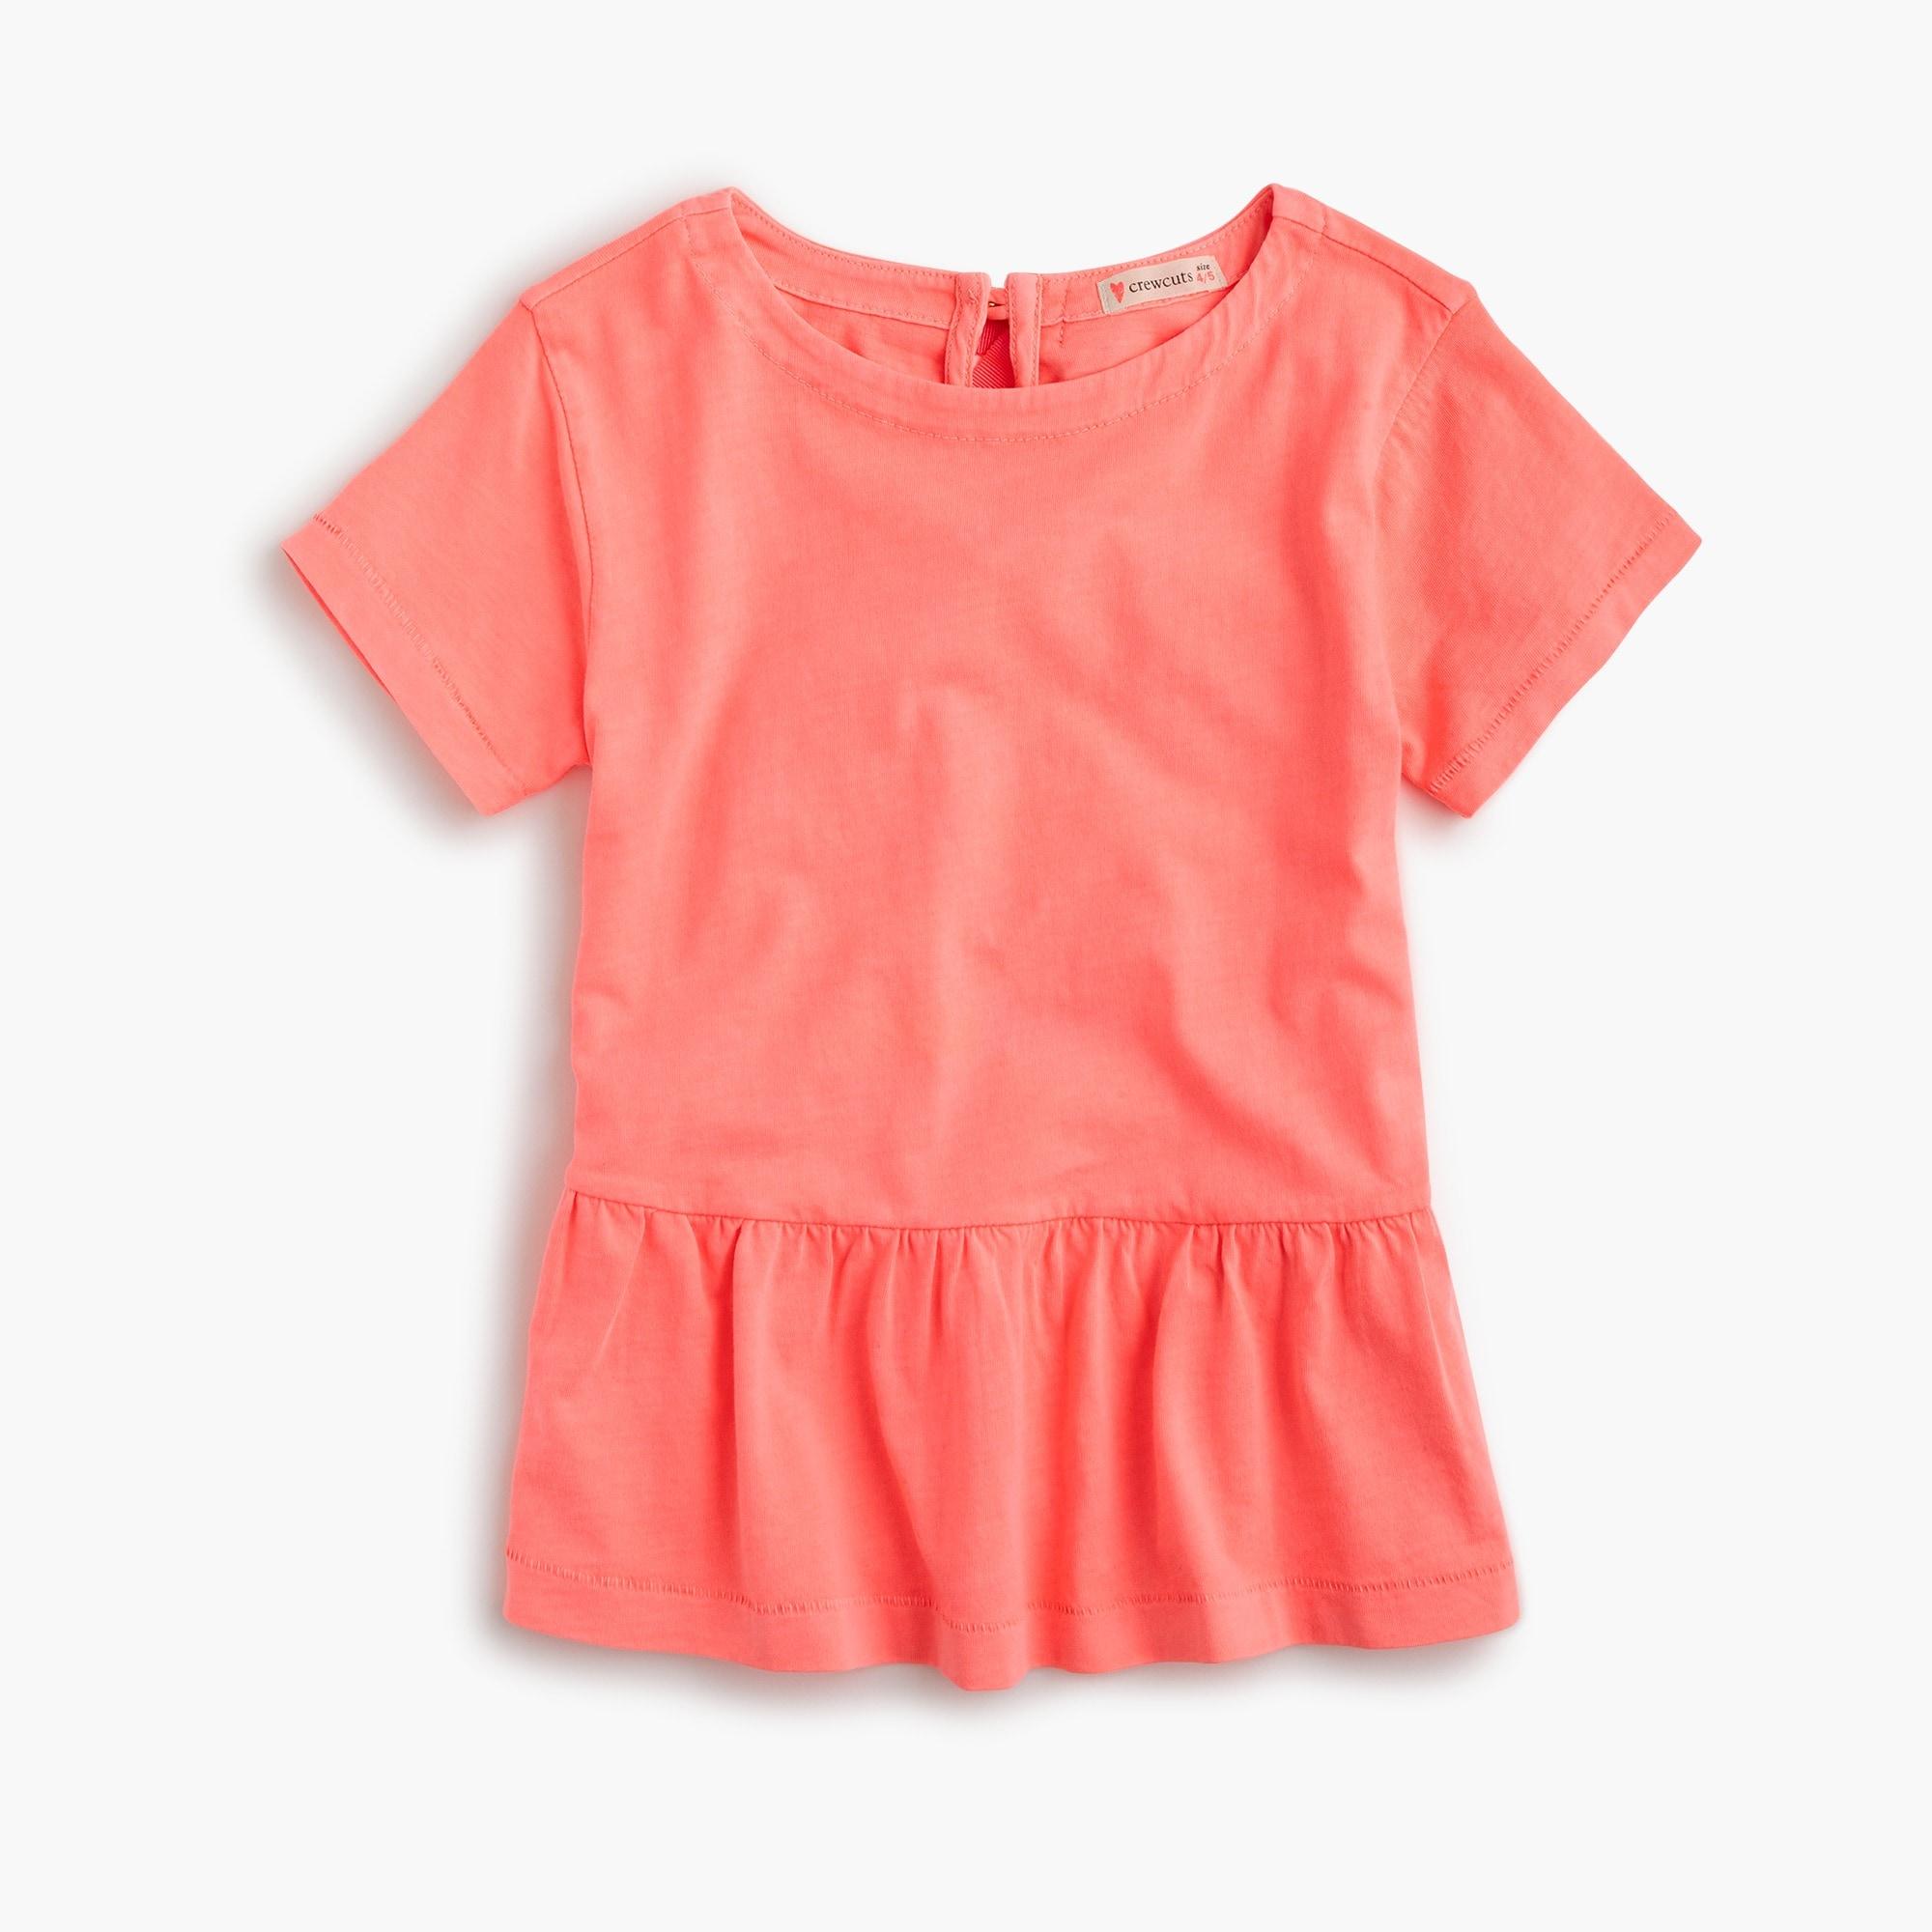 Girls' peplum T-shirt